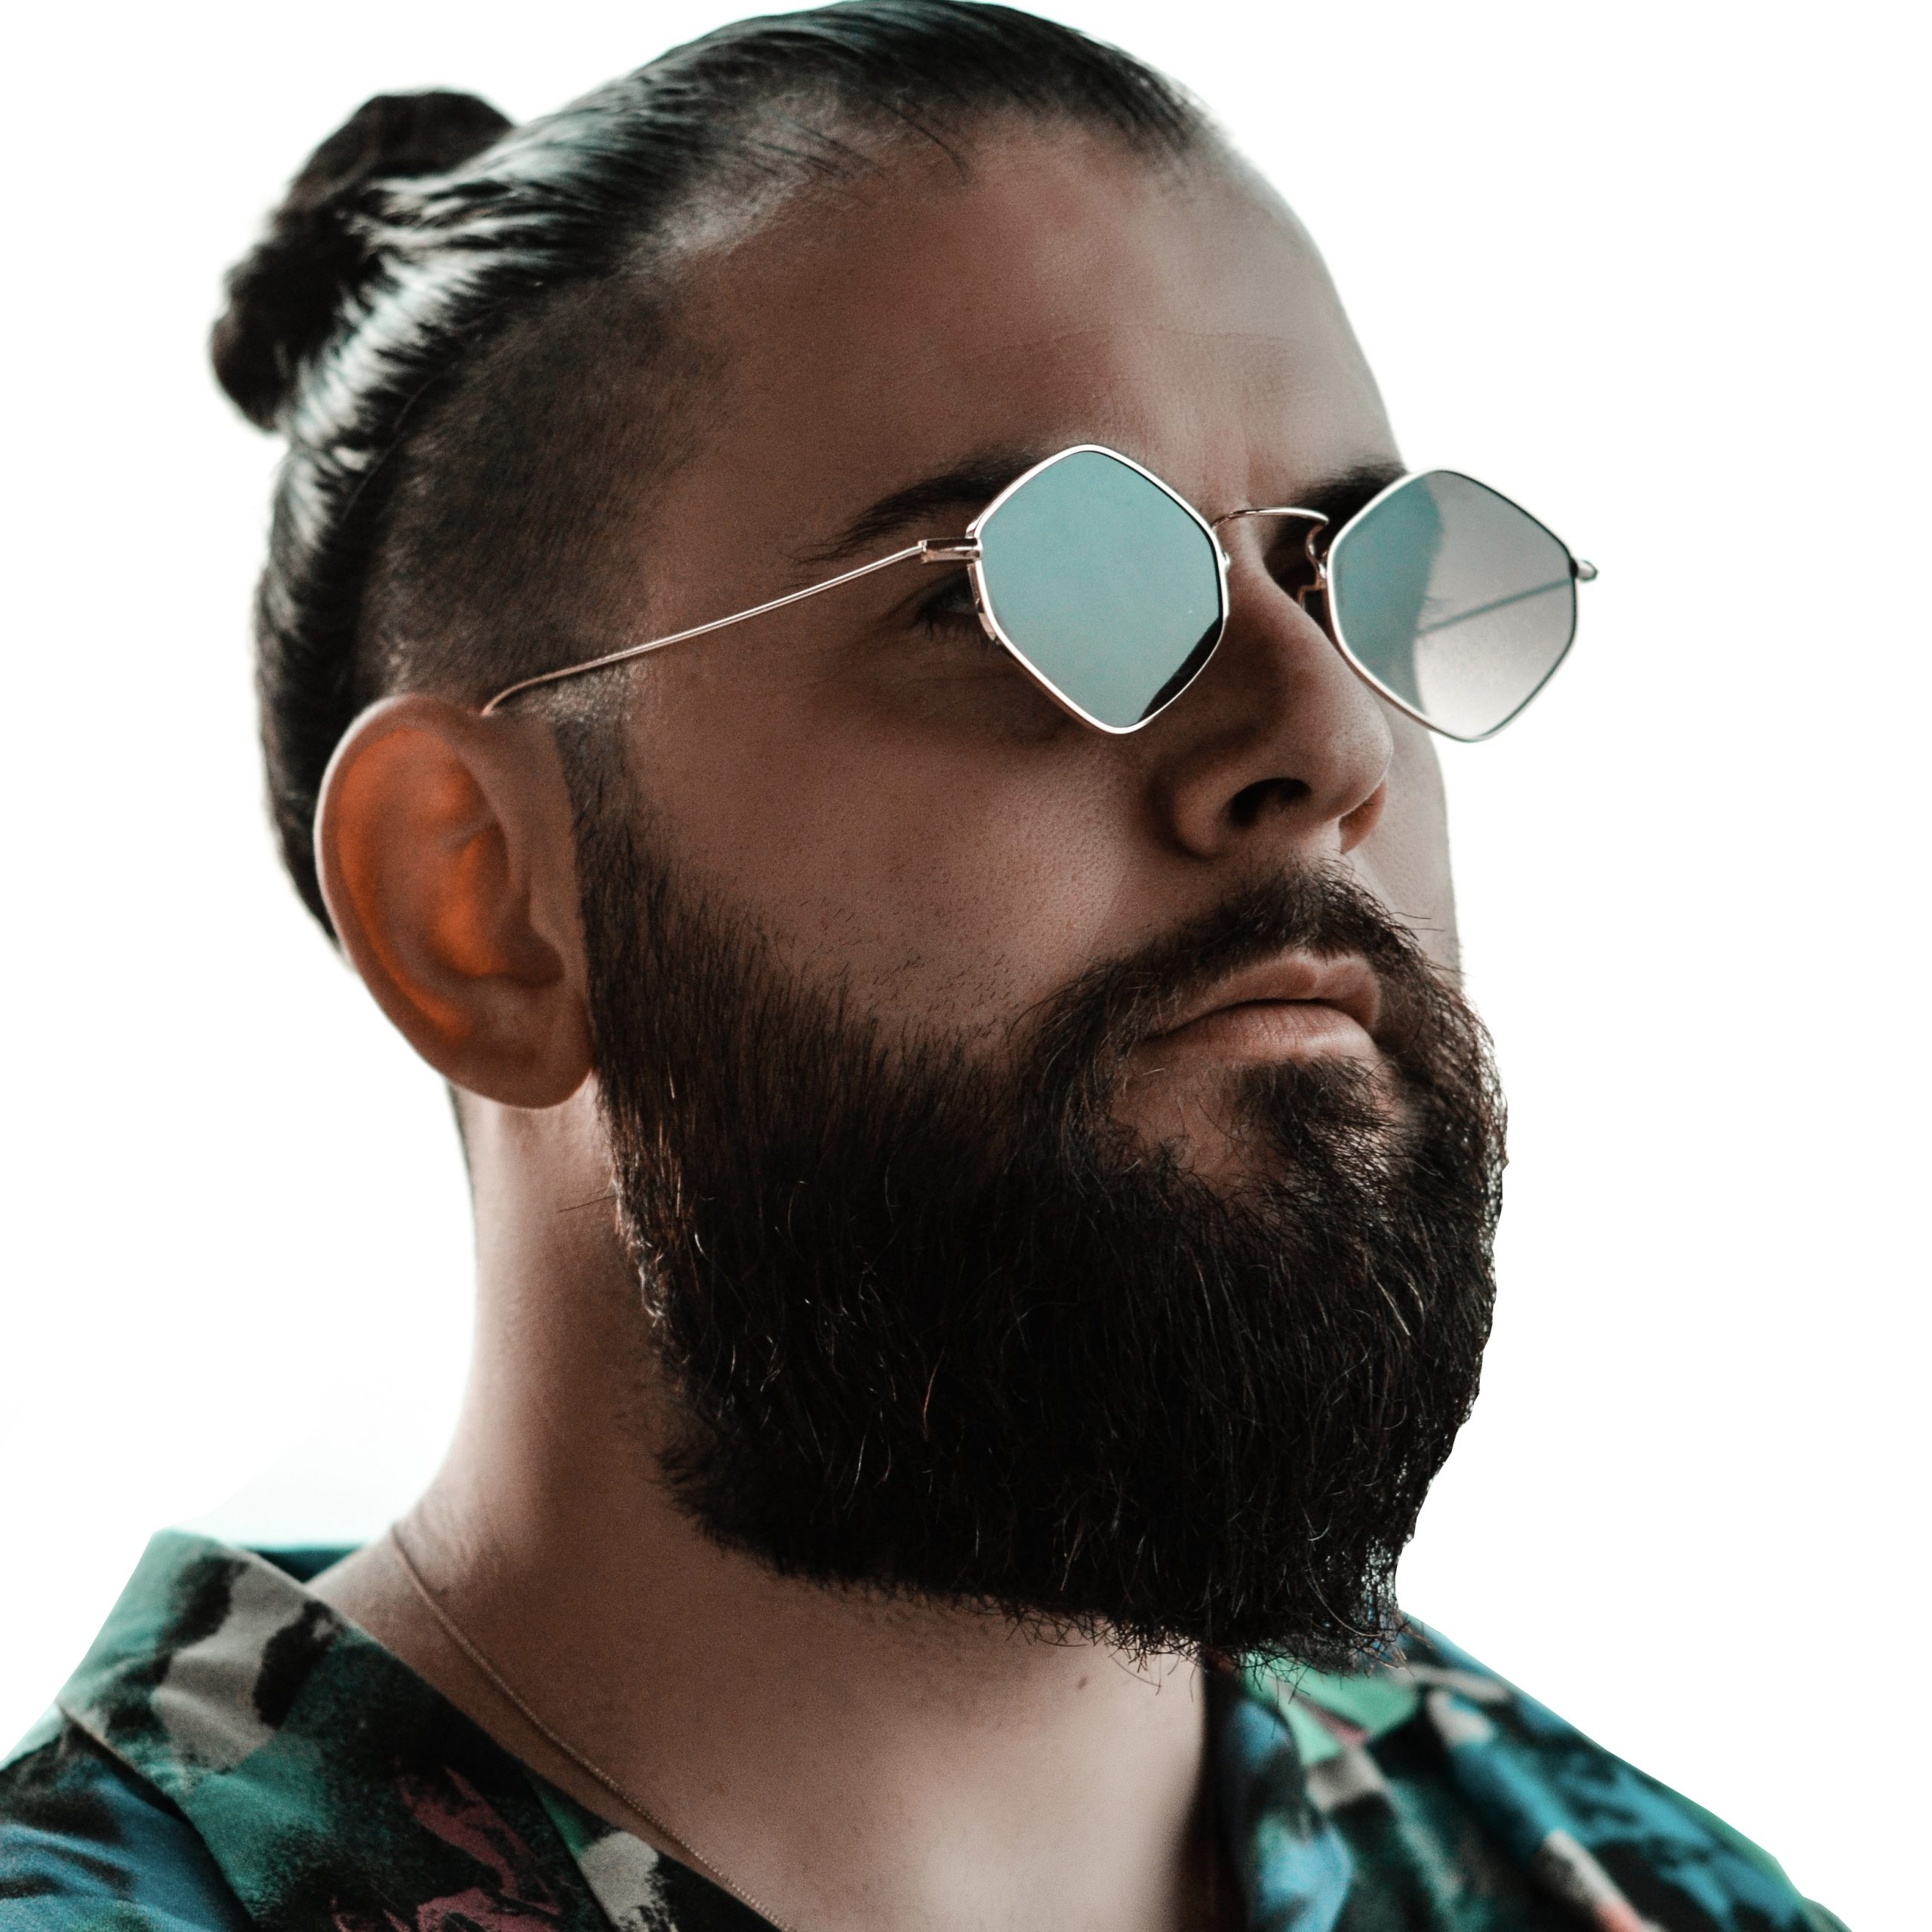 Lahox profile picture